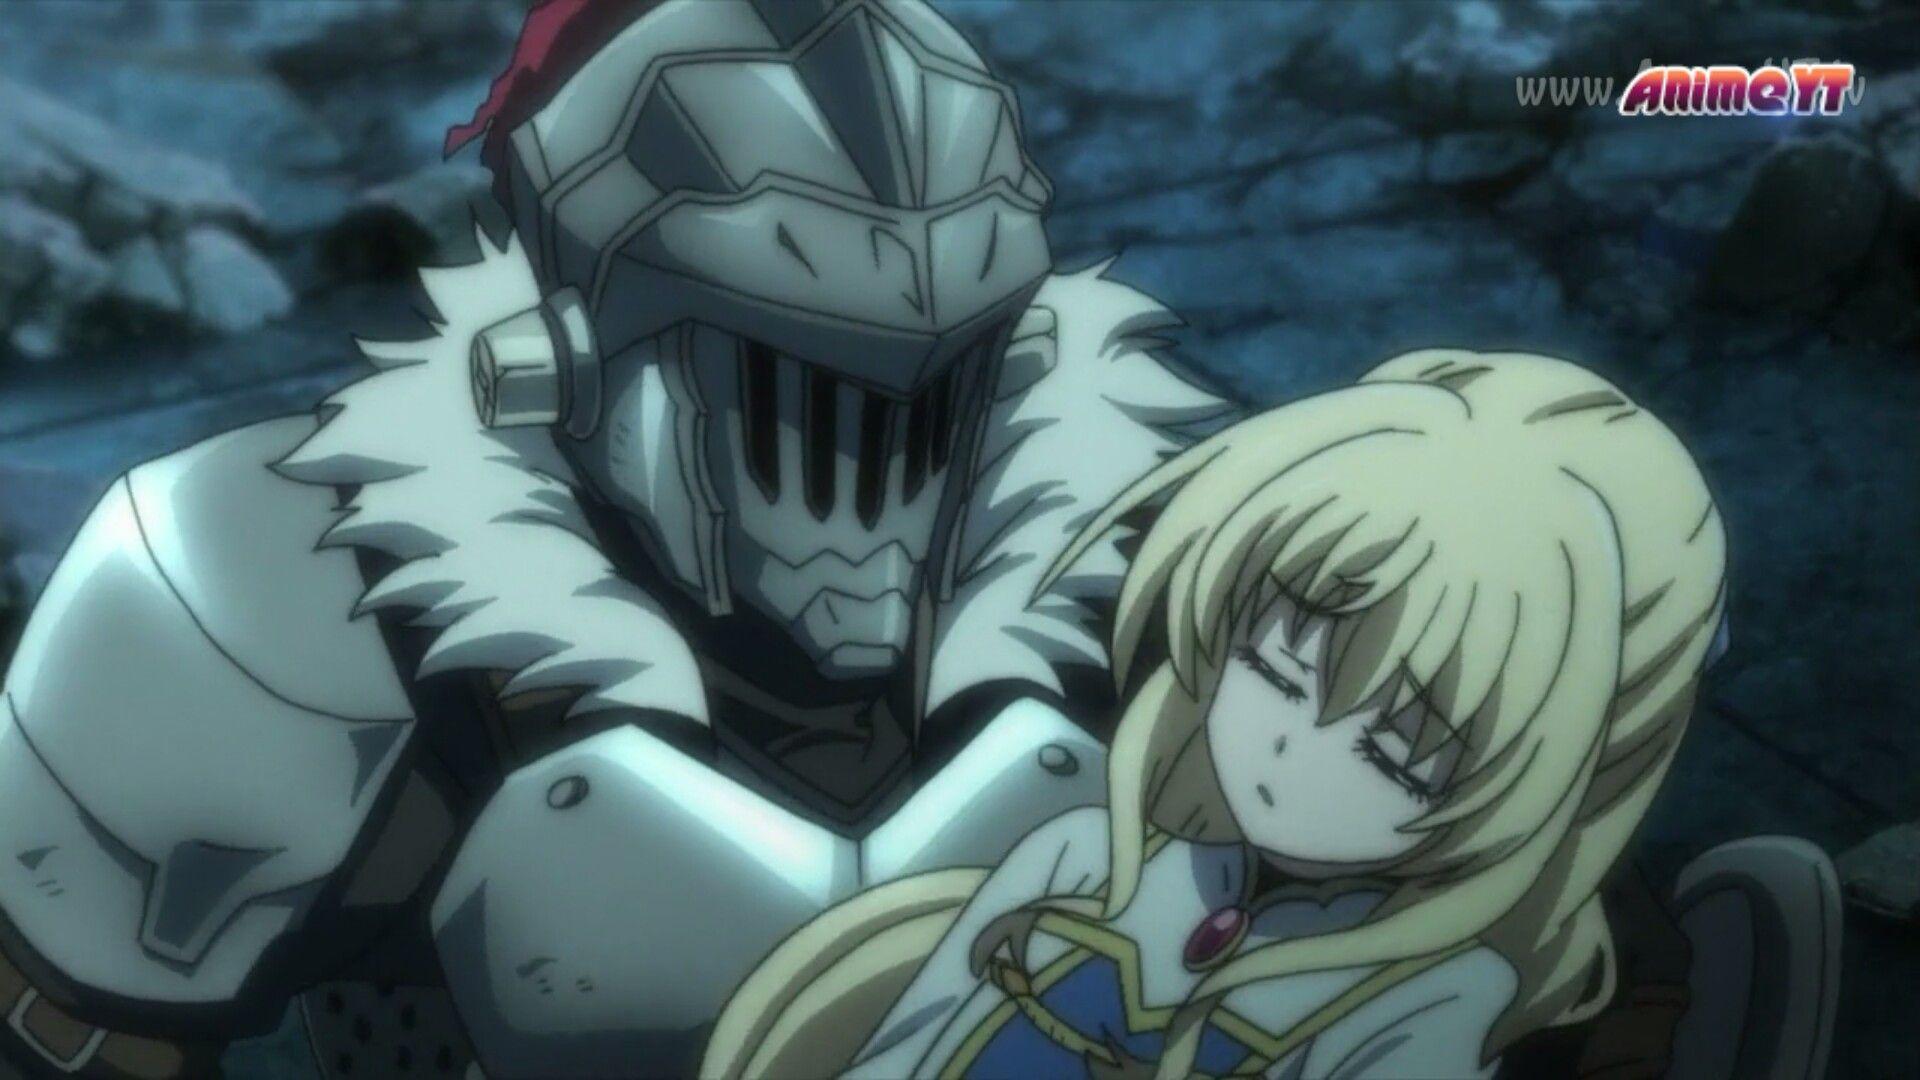 Pin by GOBURIN SUREIYA on Mi cruhs Goblin, Anime, Slayer